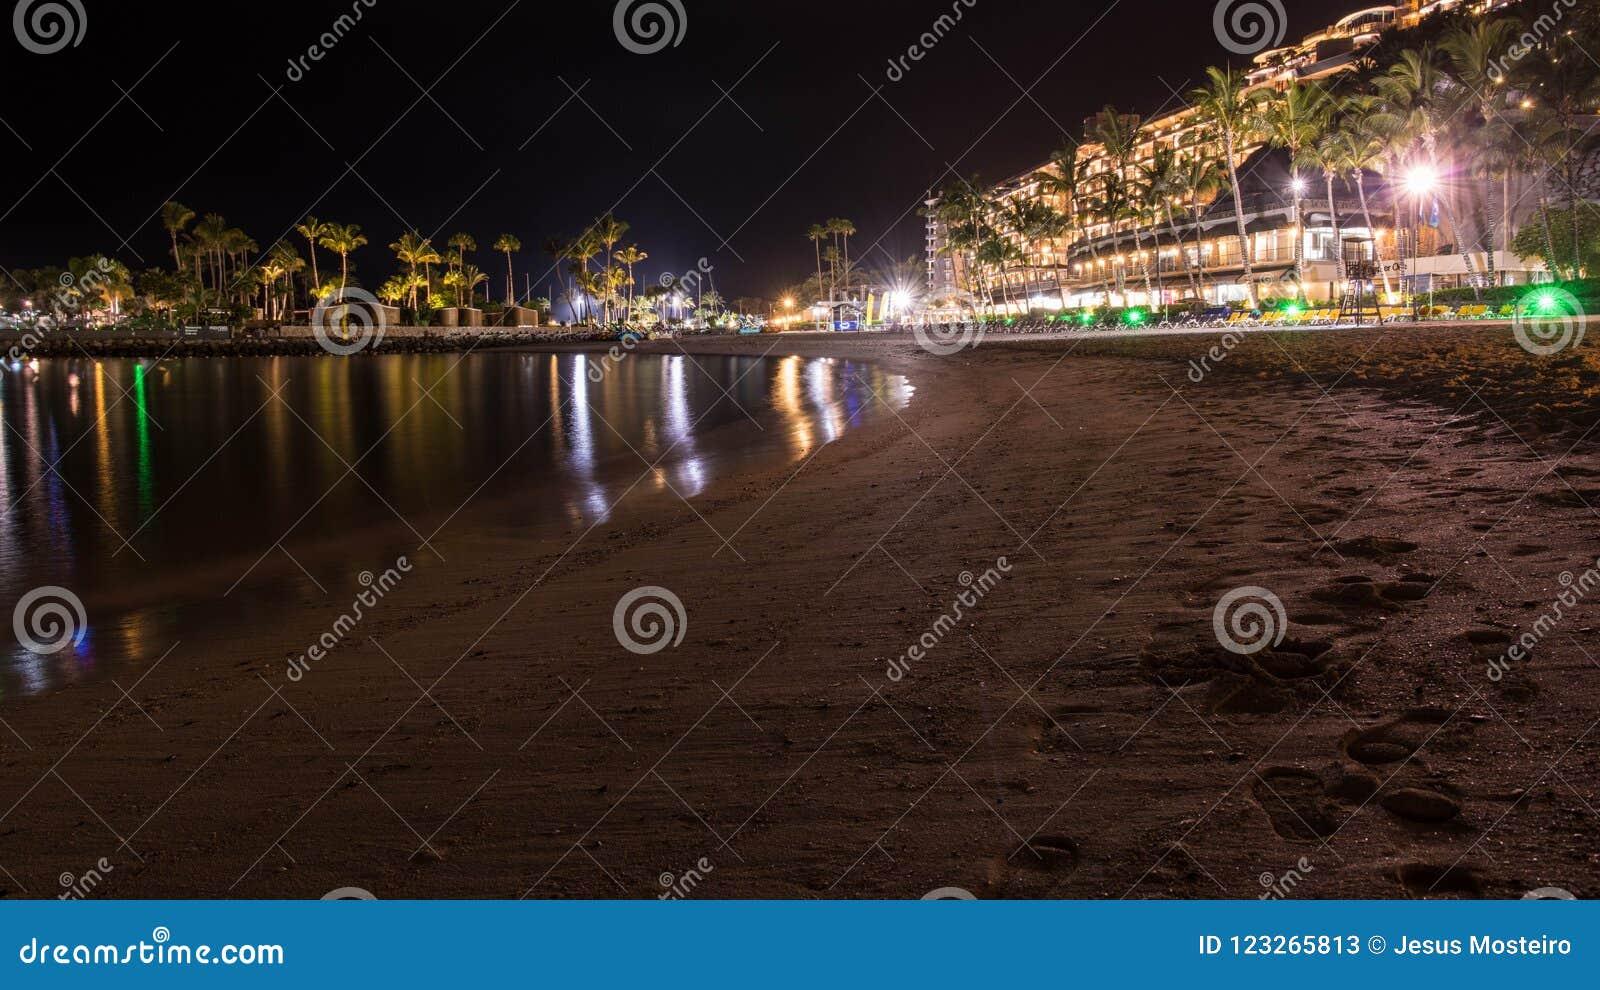 Summer night on the island of Gran Canaria Spain